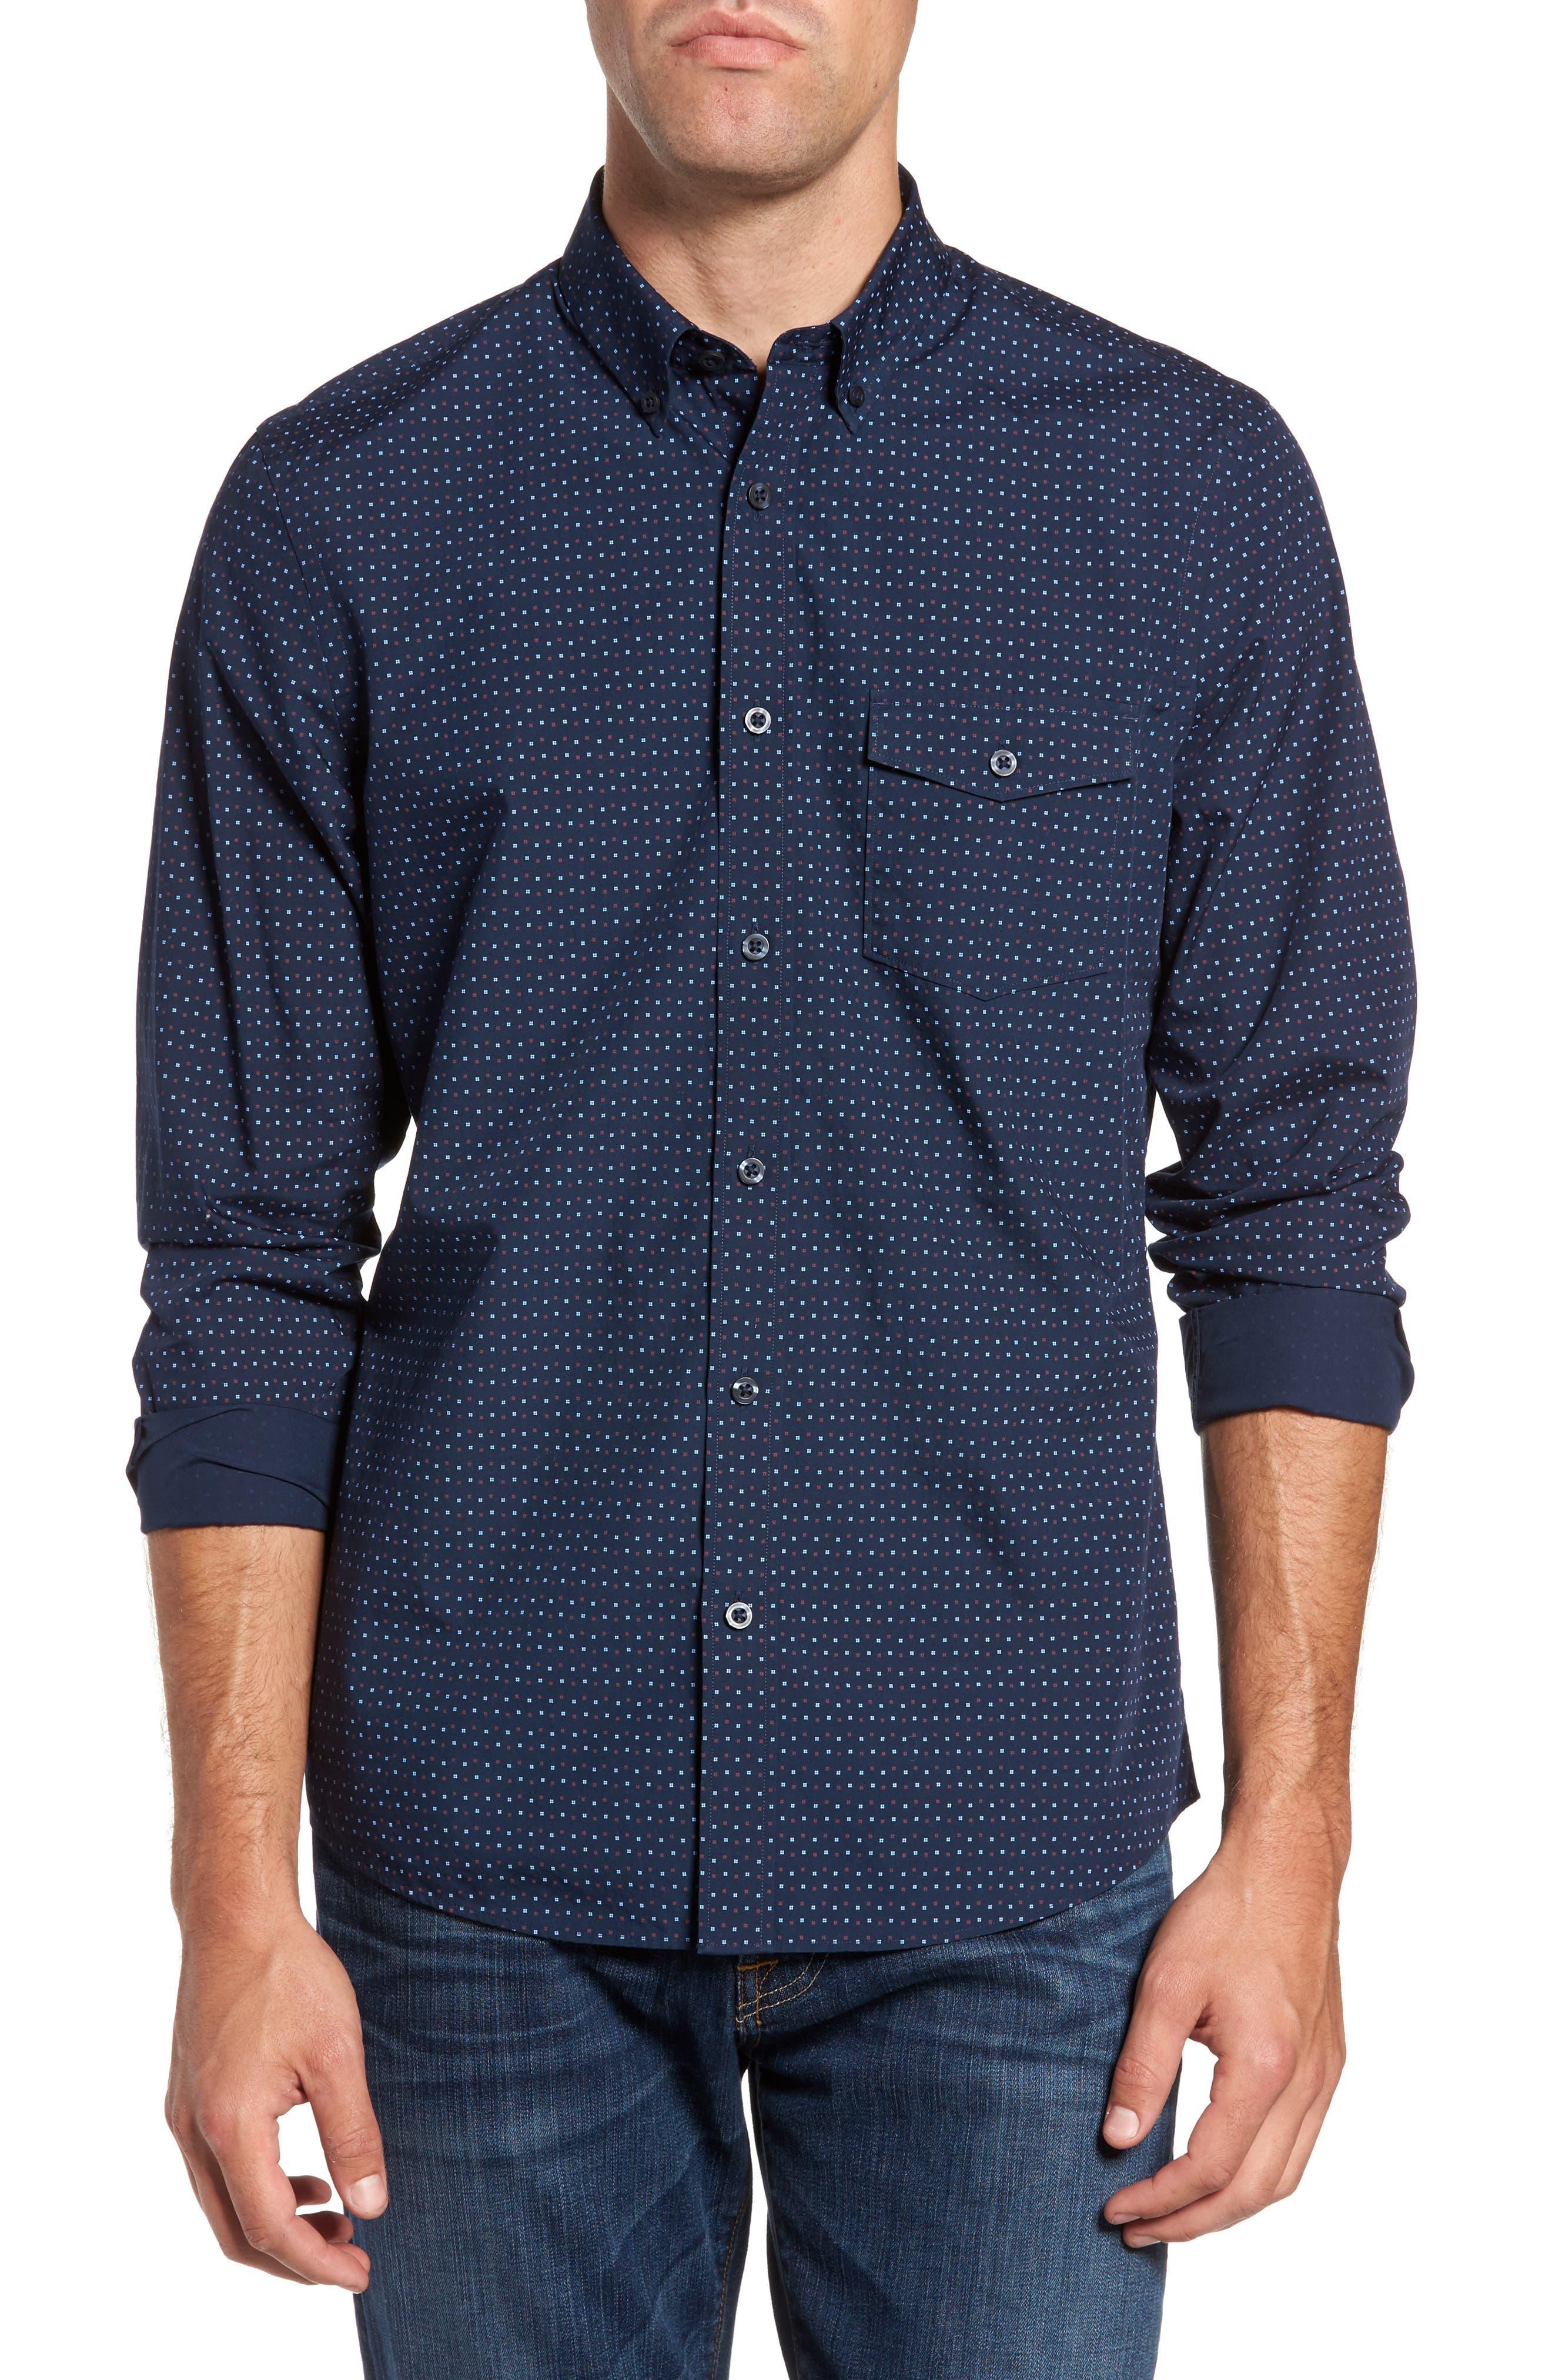 Main Image - Nordstrom Men's Shop Ivy Trim Fit Print Sport Shirt (Tall)